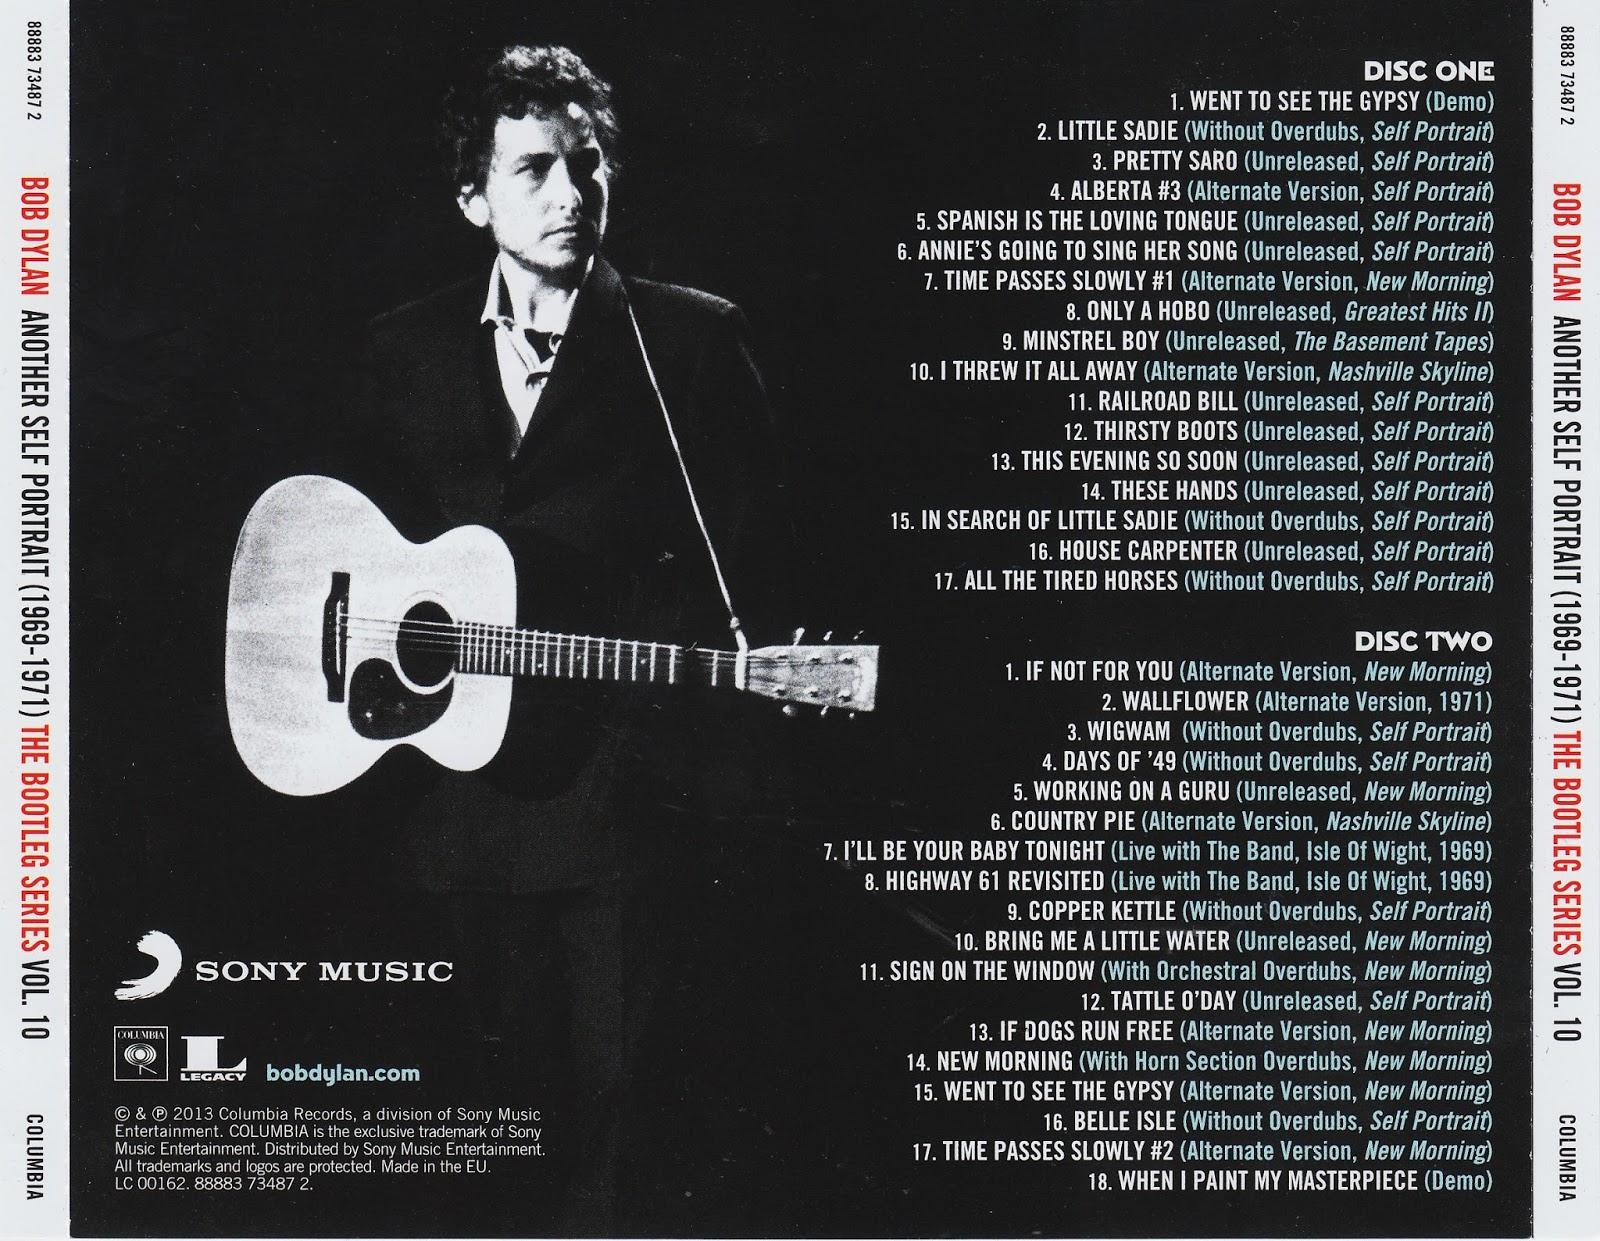 Bob Dylan Another Self Portrait Deluxe jfn music-the listenin...